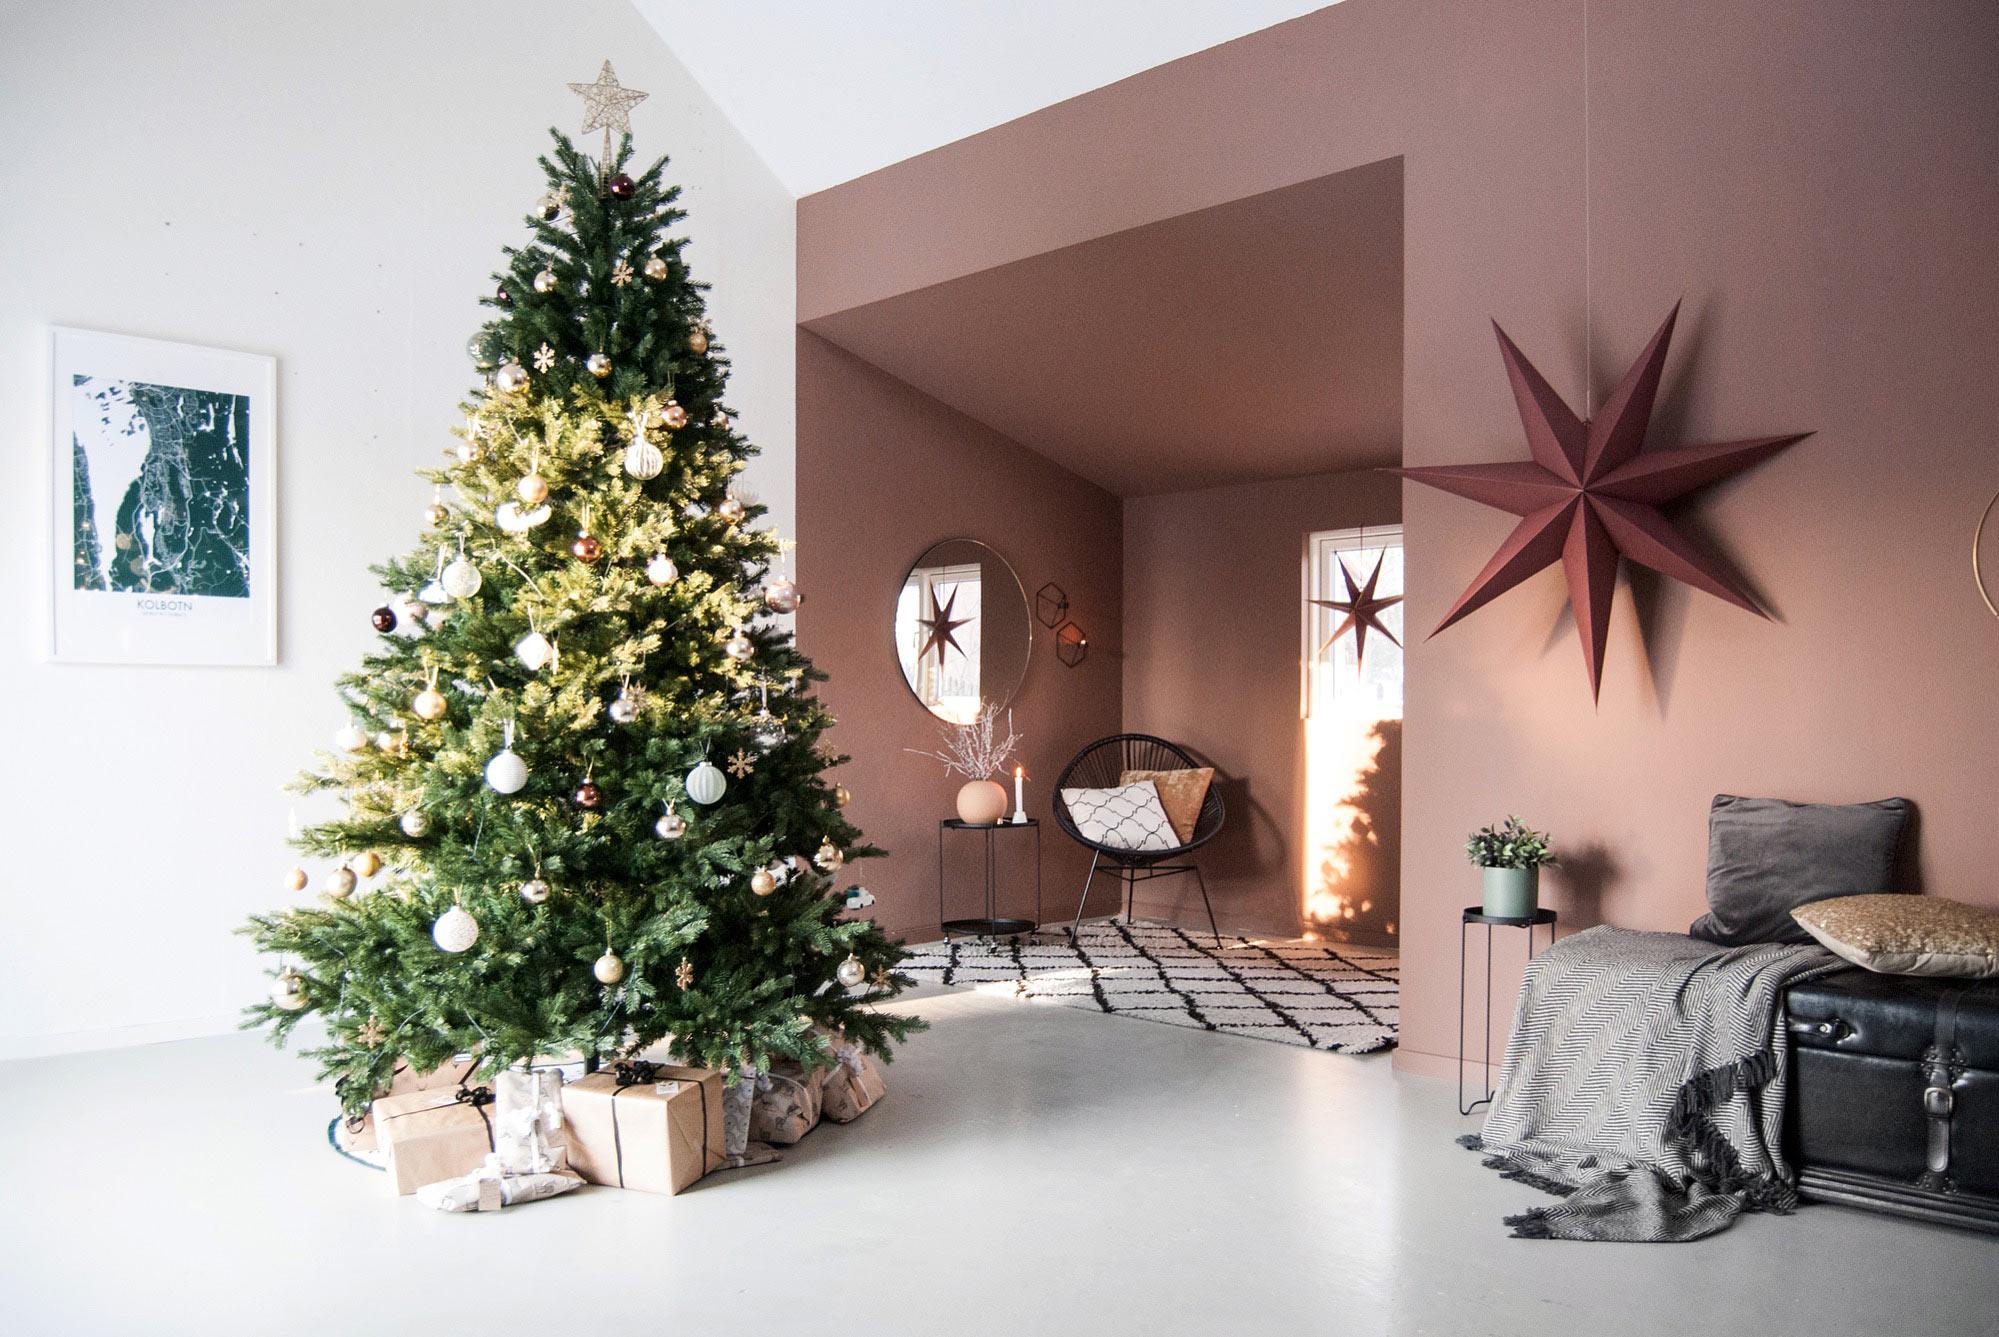 Jul i varme nyanser hos Vibeke